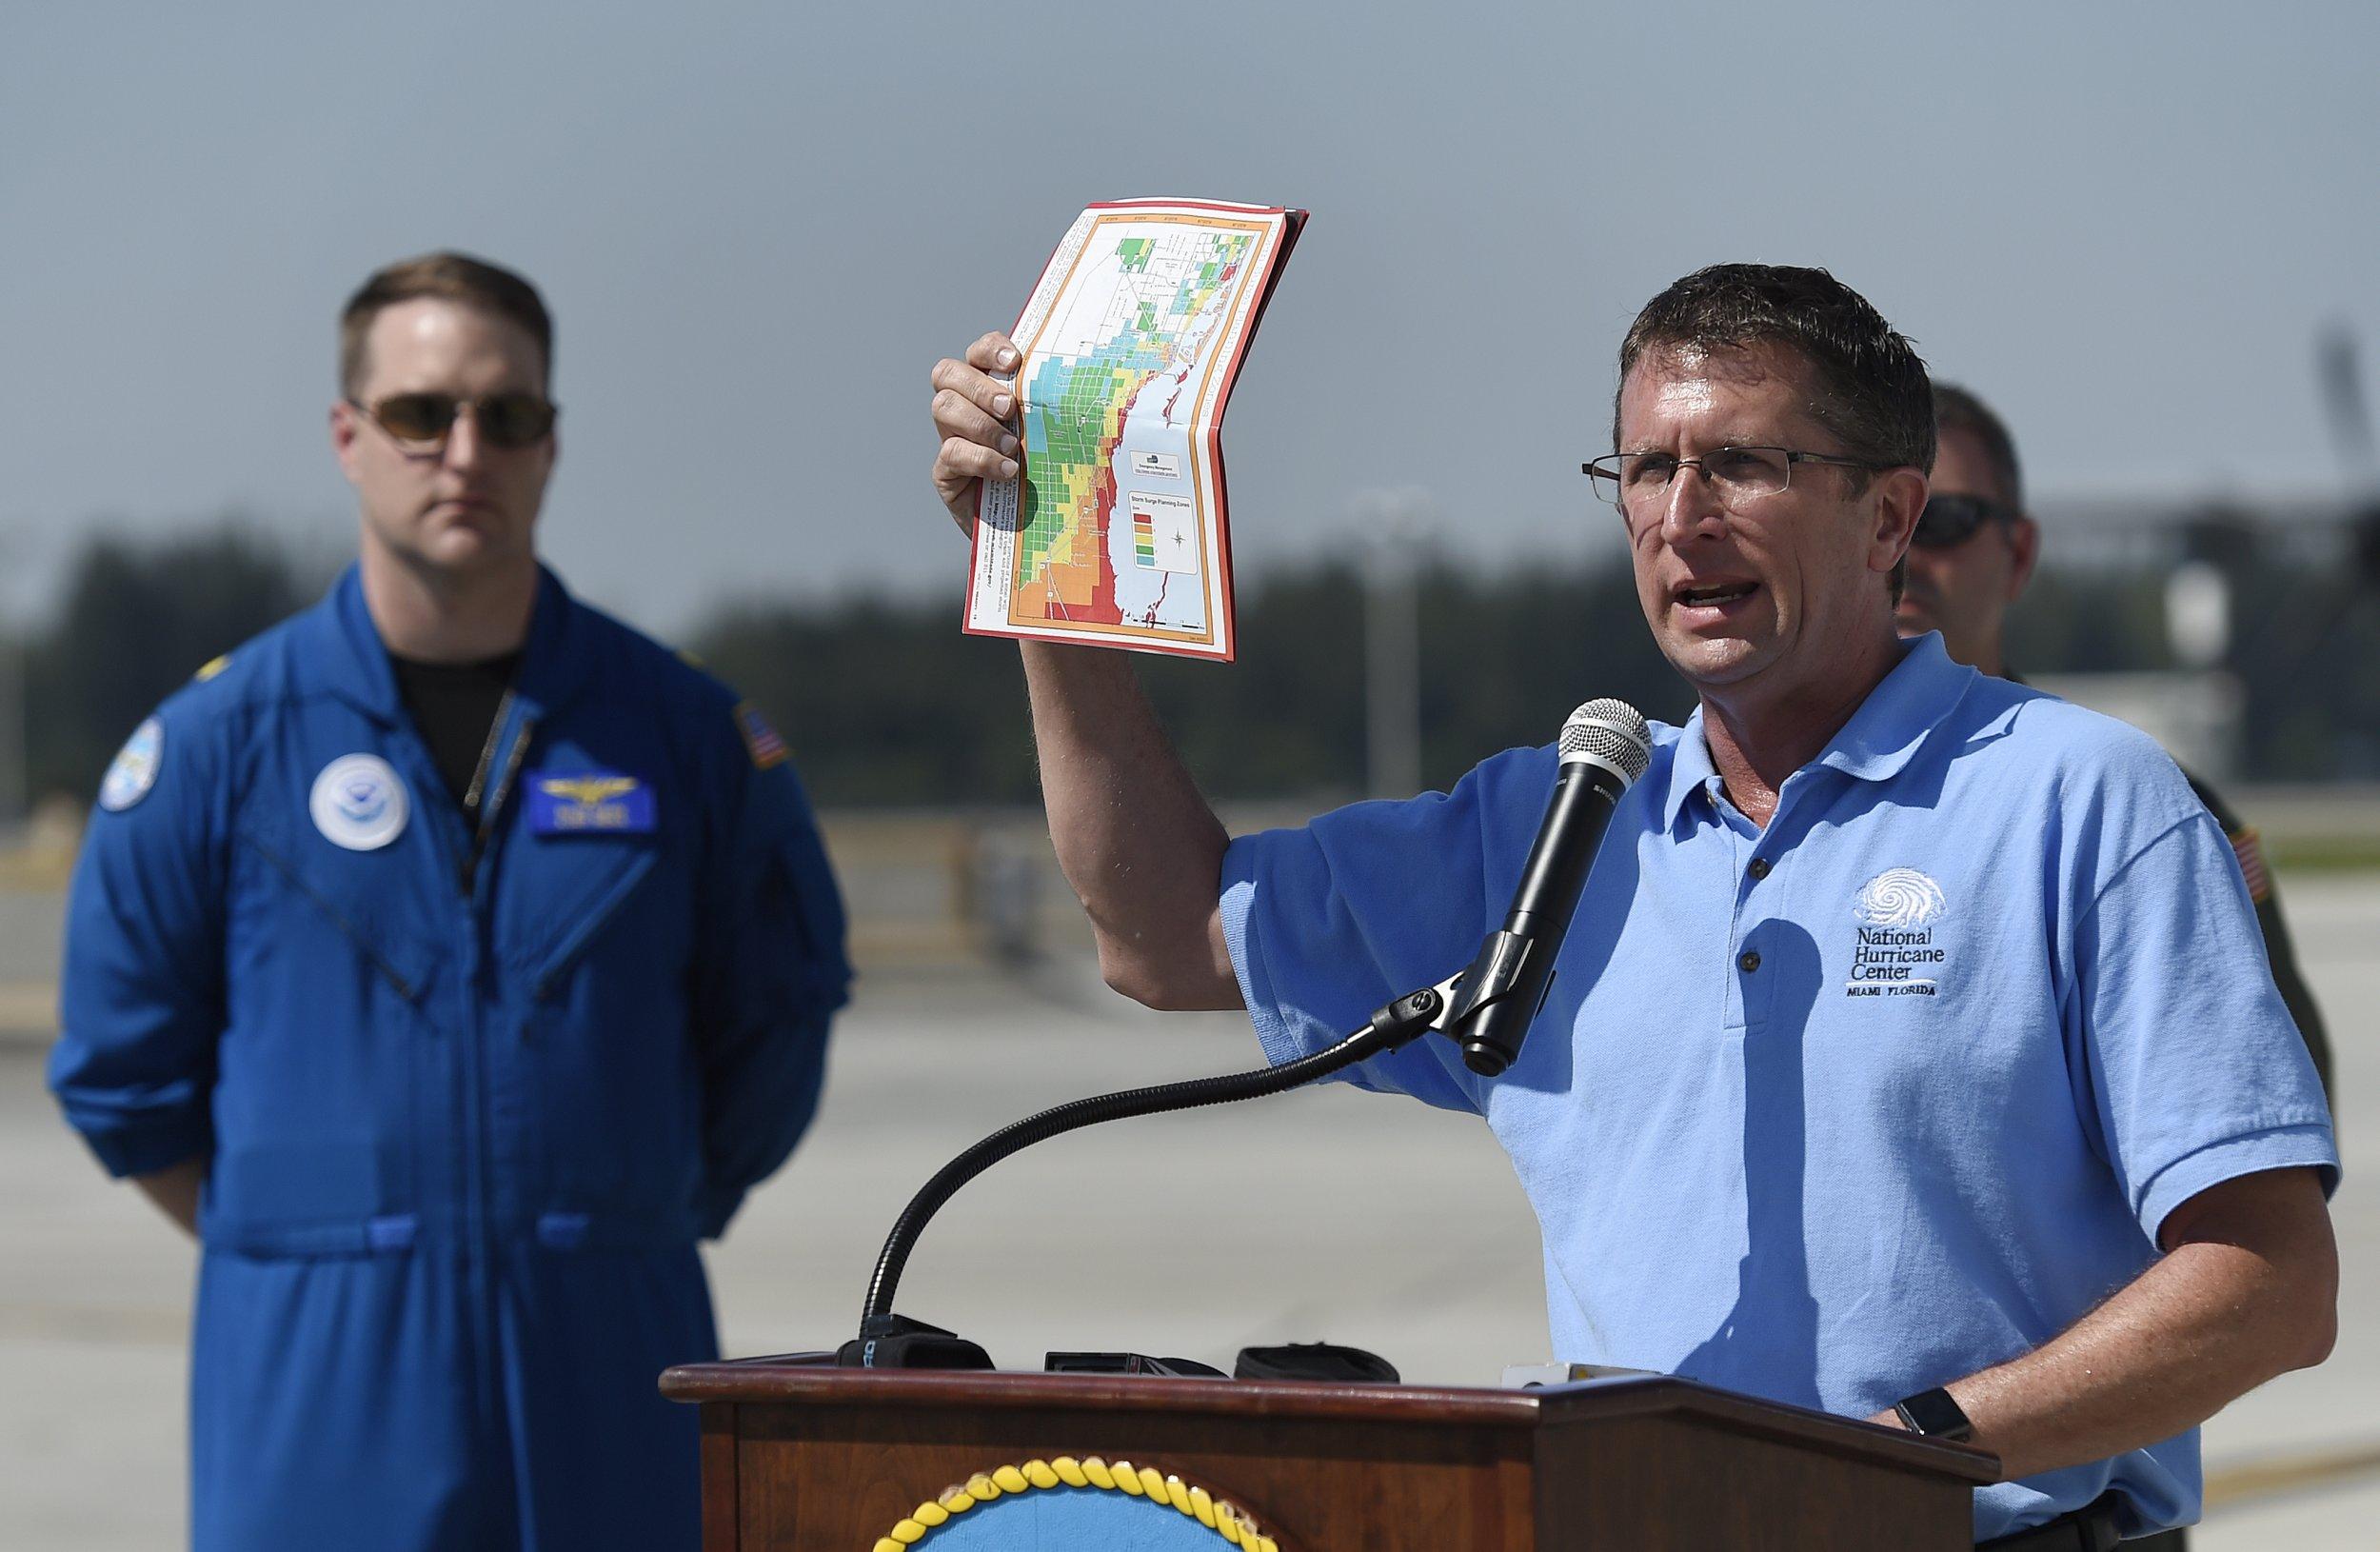 09_20_National_Hurricane_Center_director